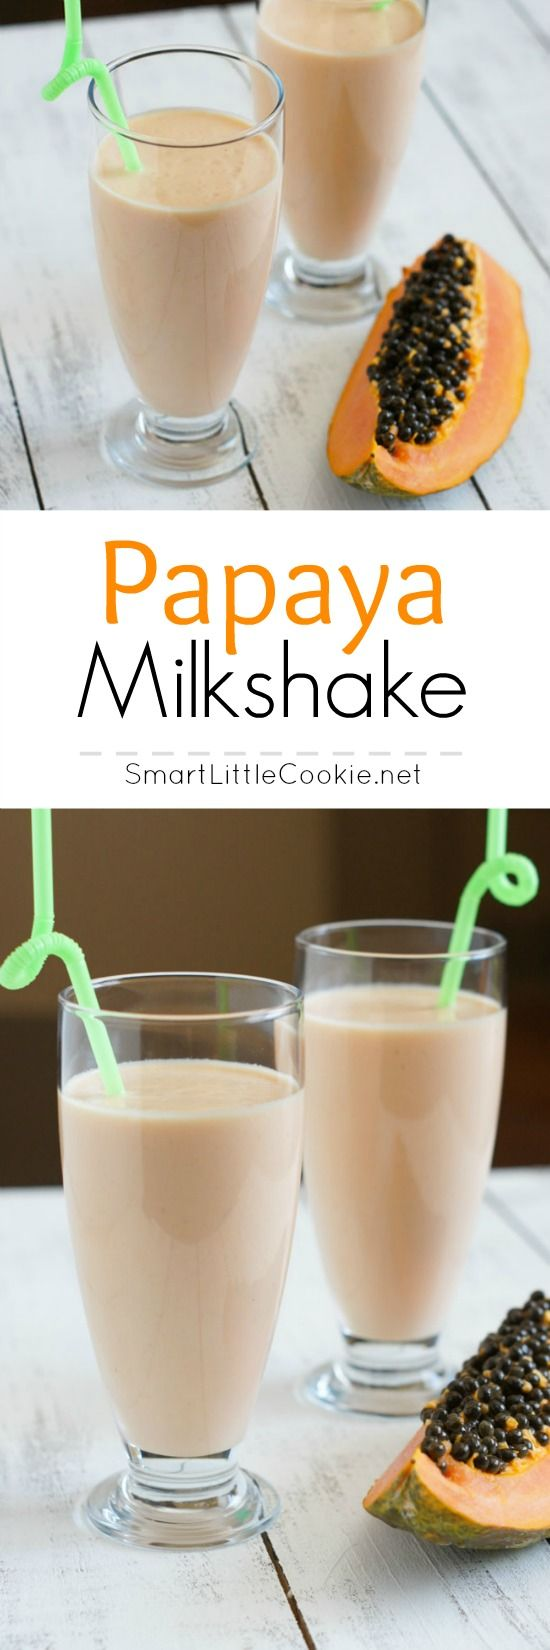 Papaya Milkshake (Batido de Lechoza) photography